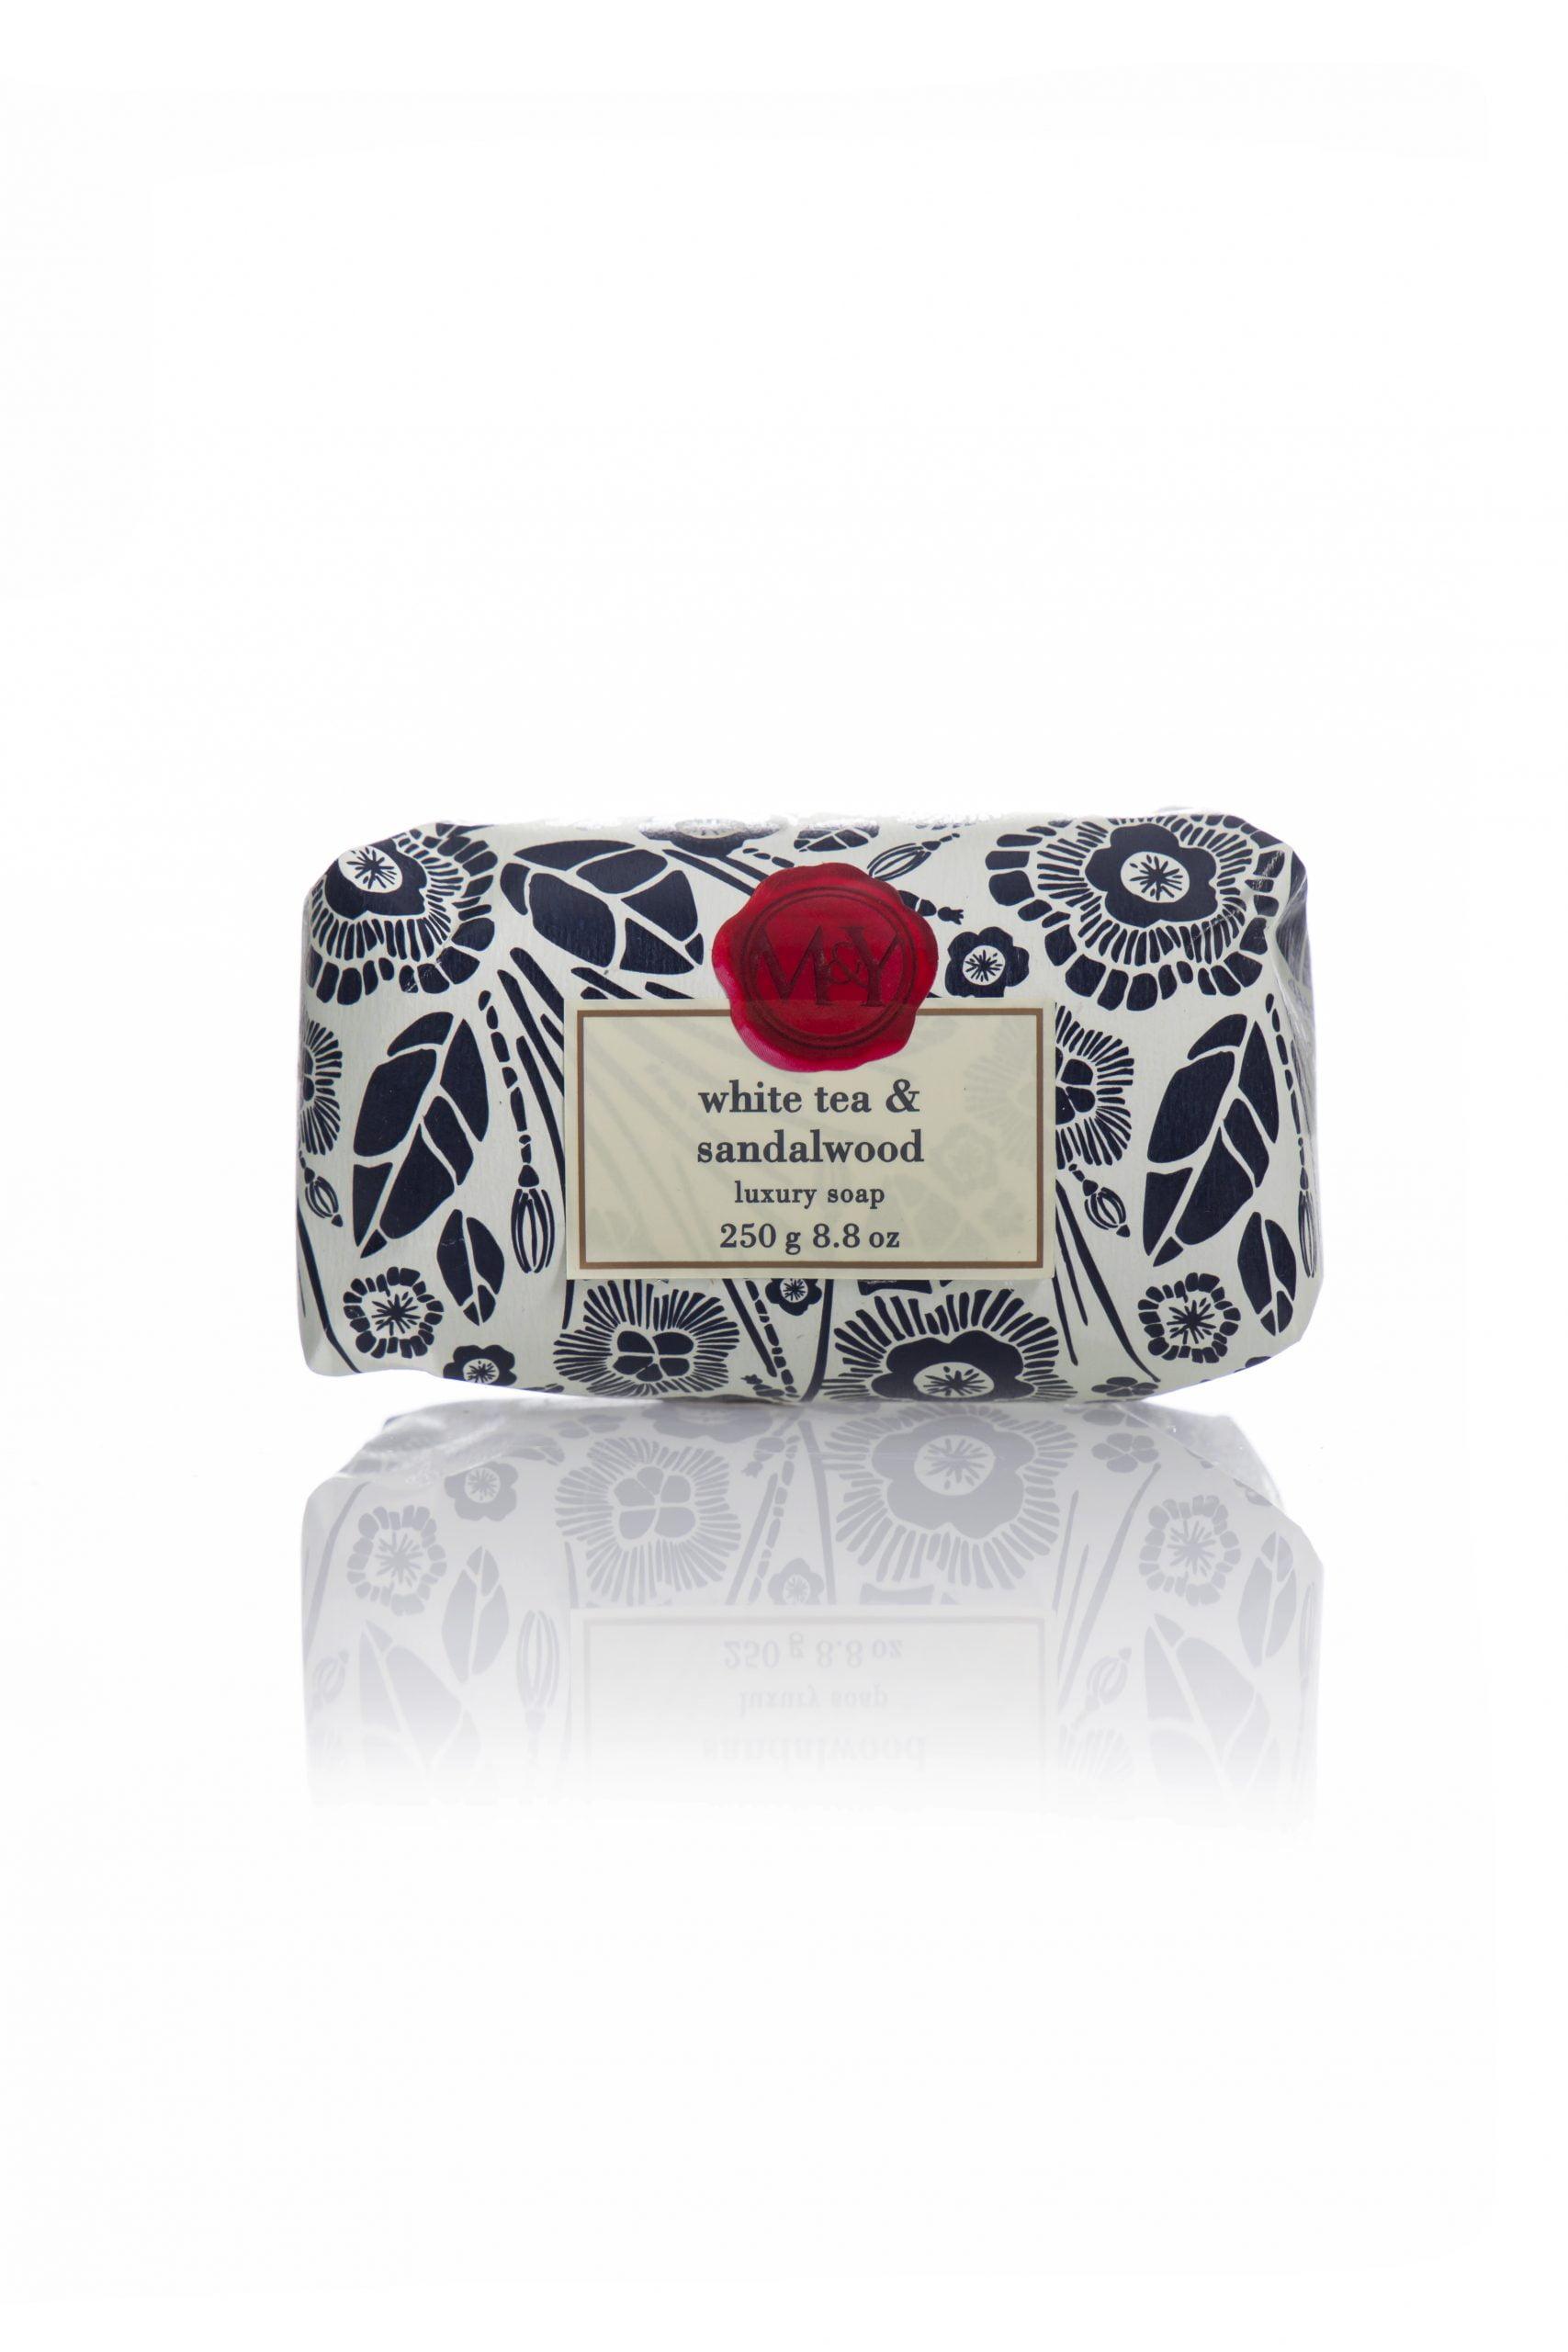 MY-White-Tea-Sandalwood-250g-Luxury-Soap-scaled-1.jpg